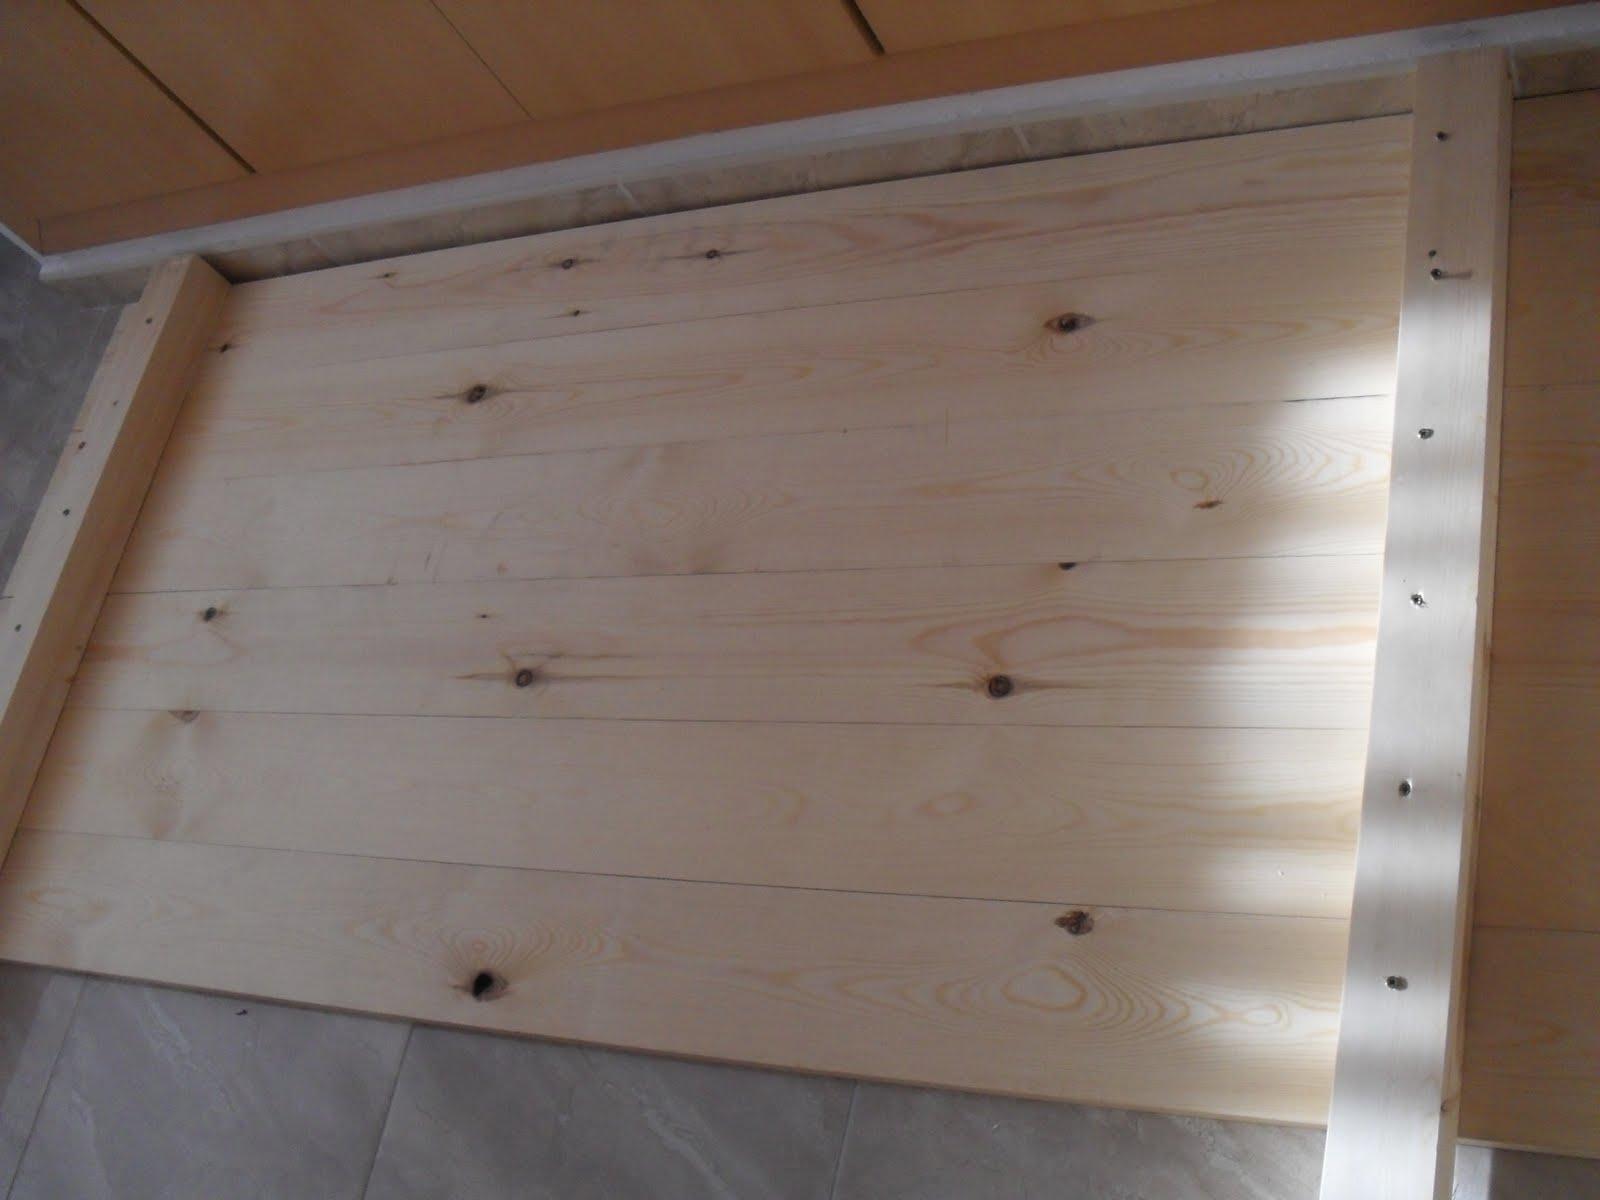 Mis manos molan cabezal de listones de madera - Cabezal de madera ...